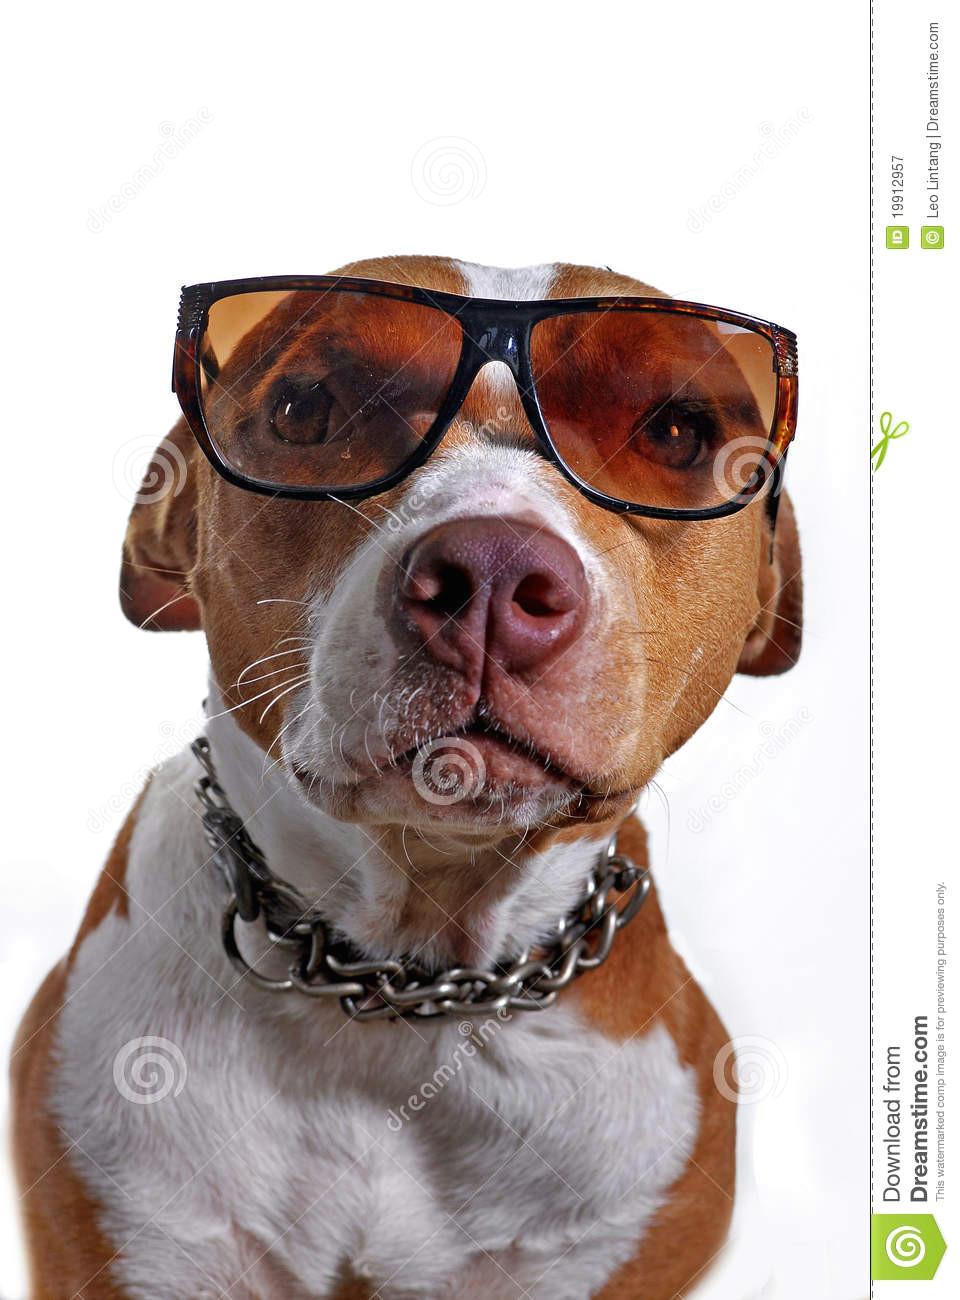 Drawing Of Dog Wearing Sunglasses Pitbull Dog Wearing Glasses Stock Image Image Of Portrait Head